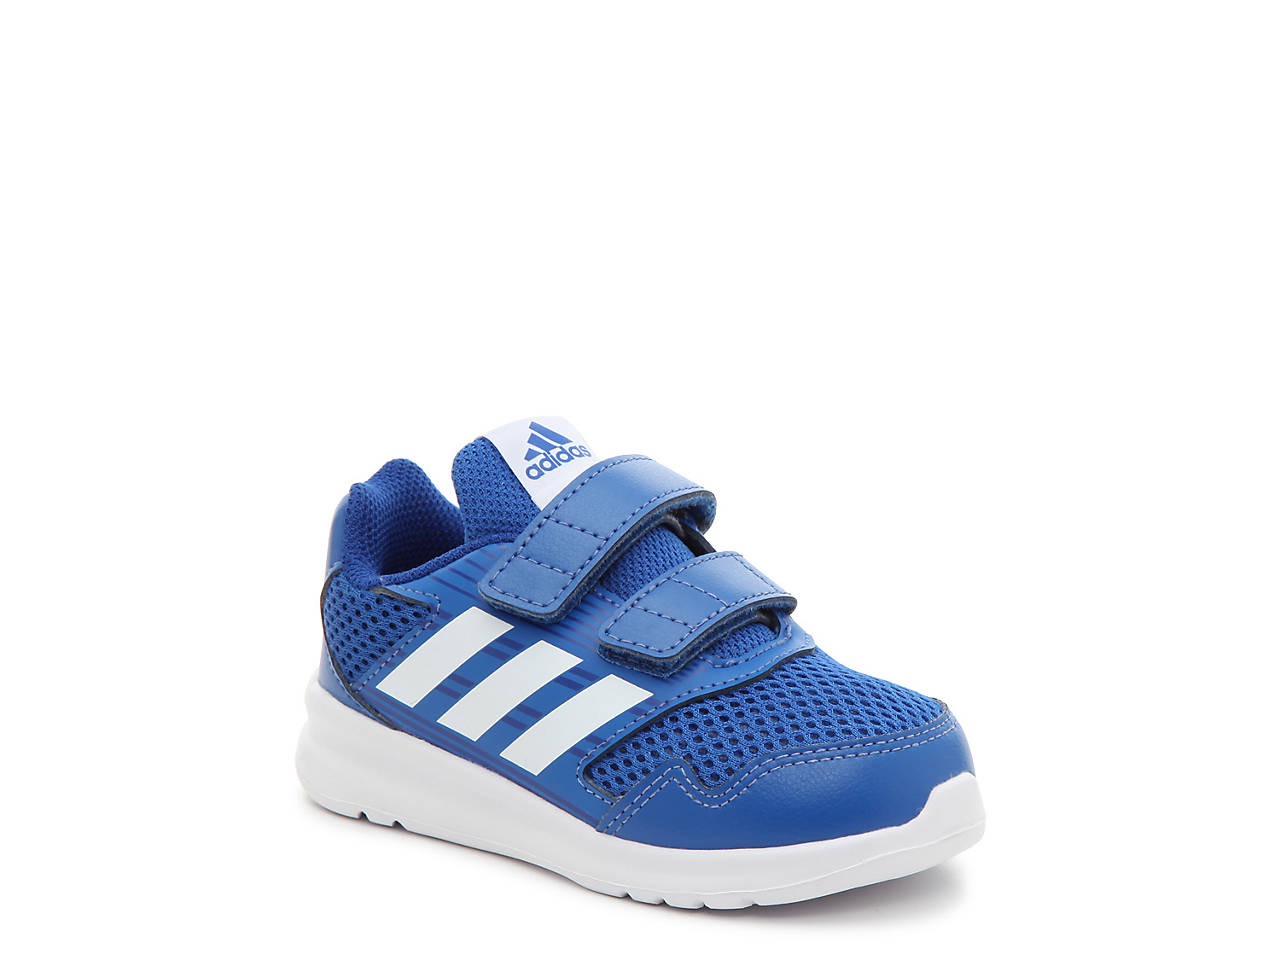 detailed look 42747 f0bae adidas. Altarun Toddler Sneaker